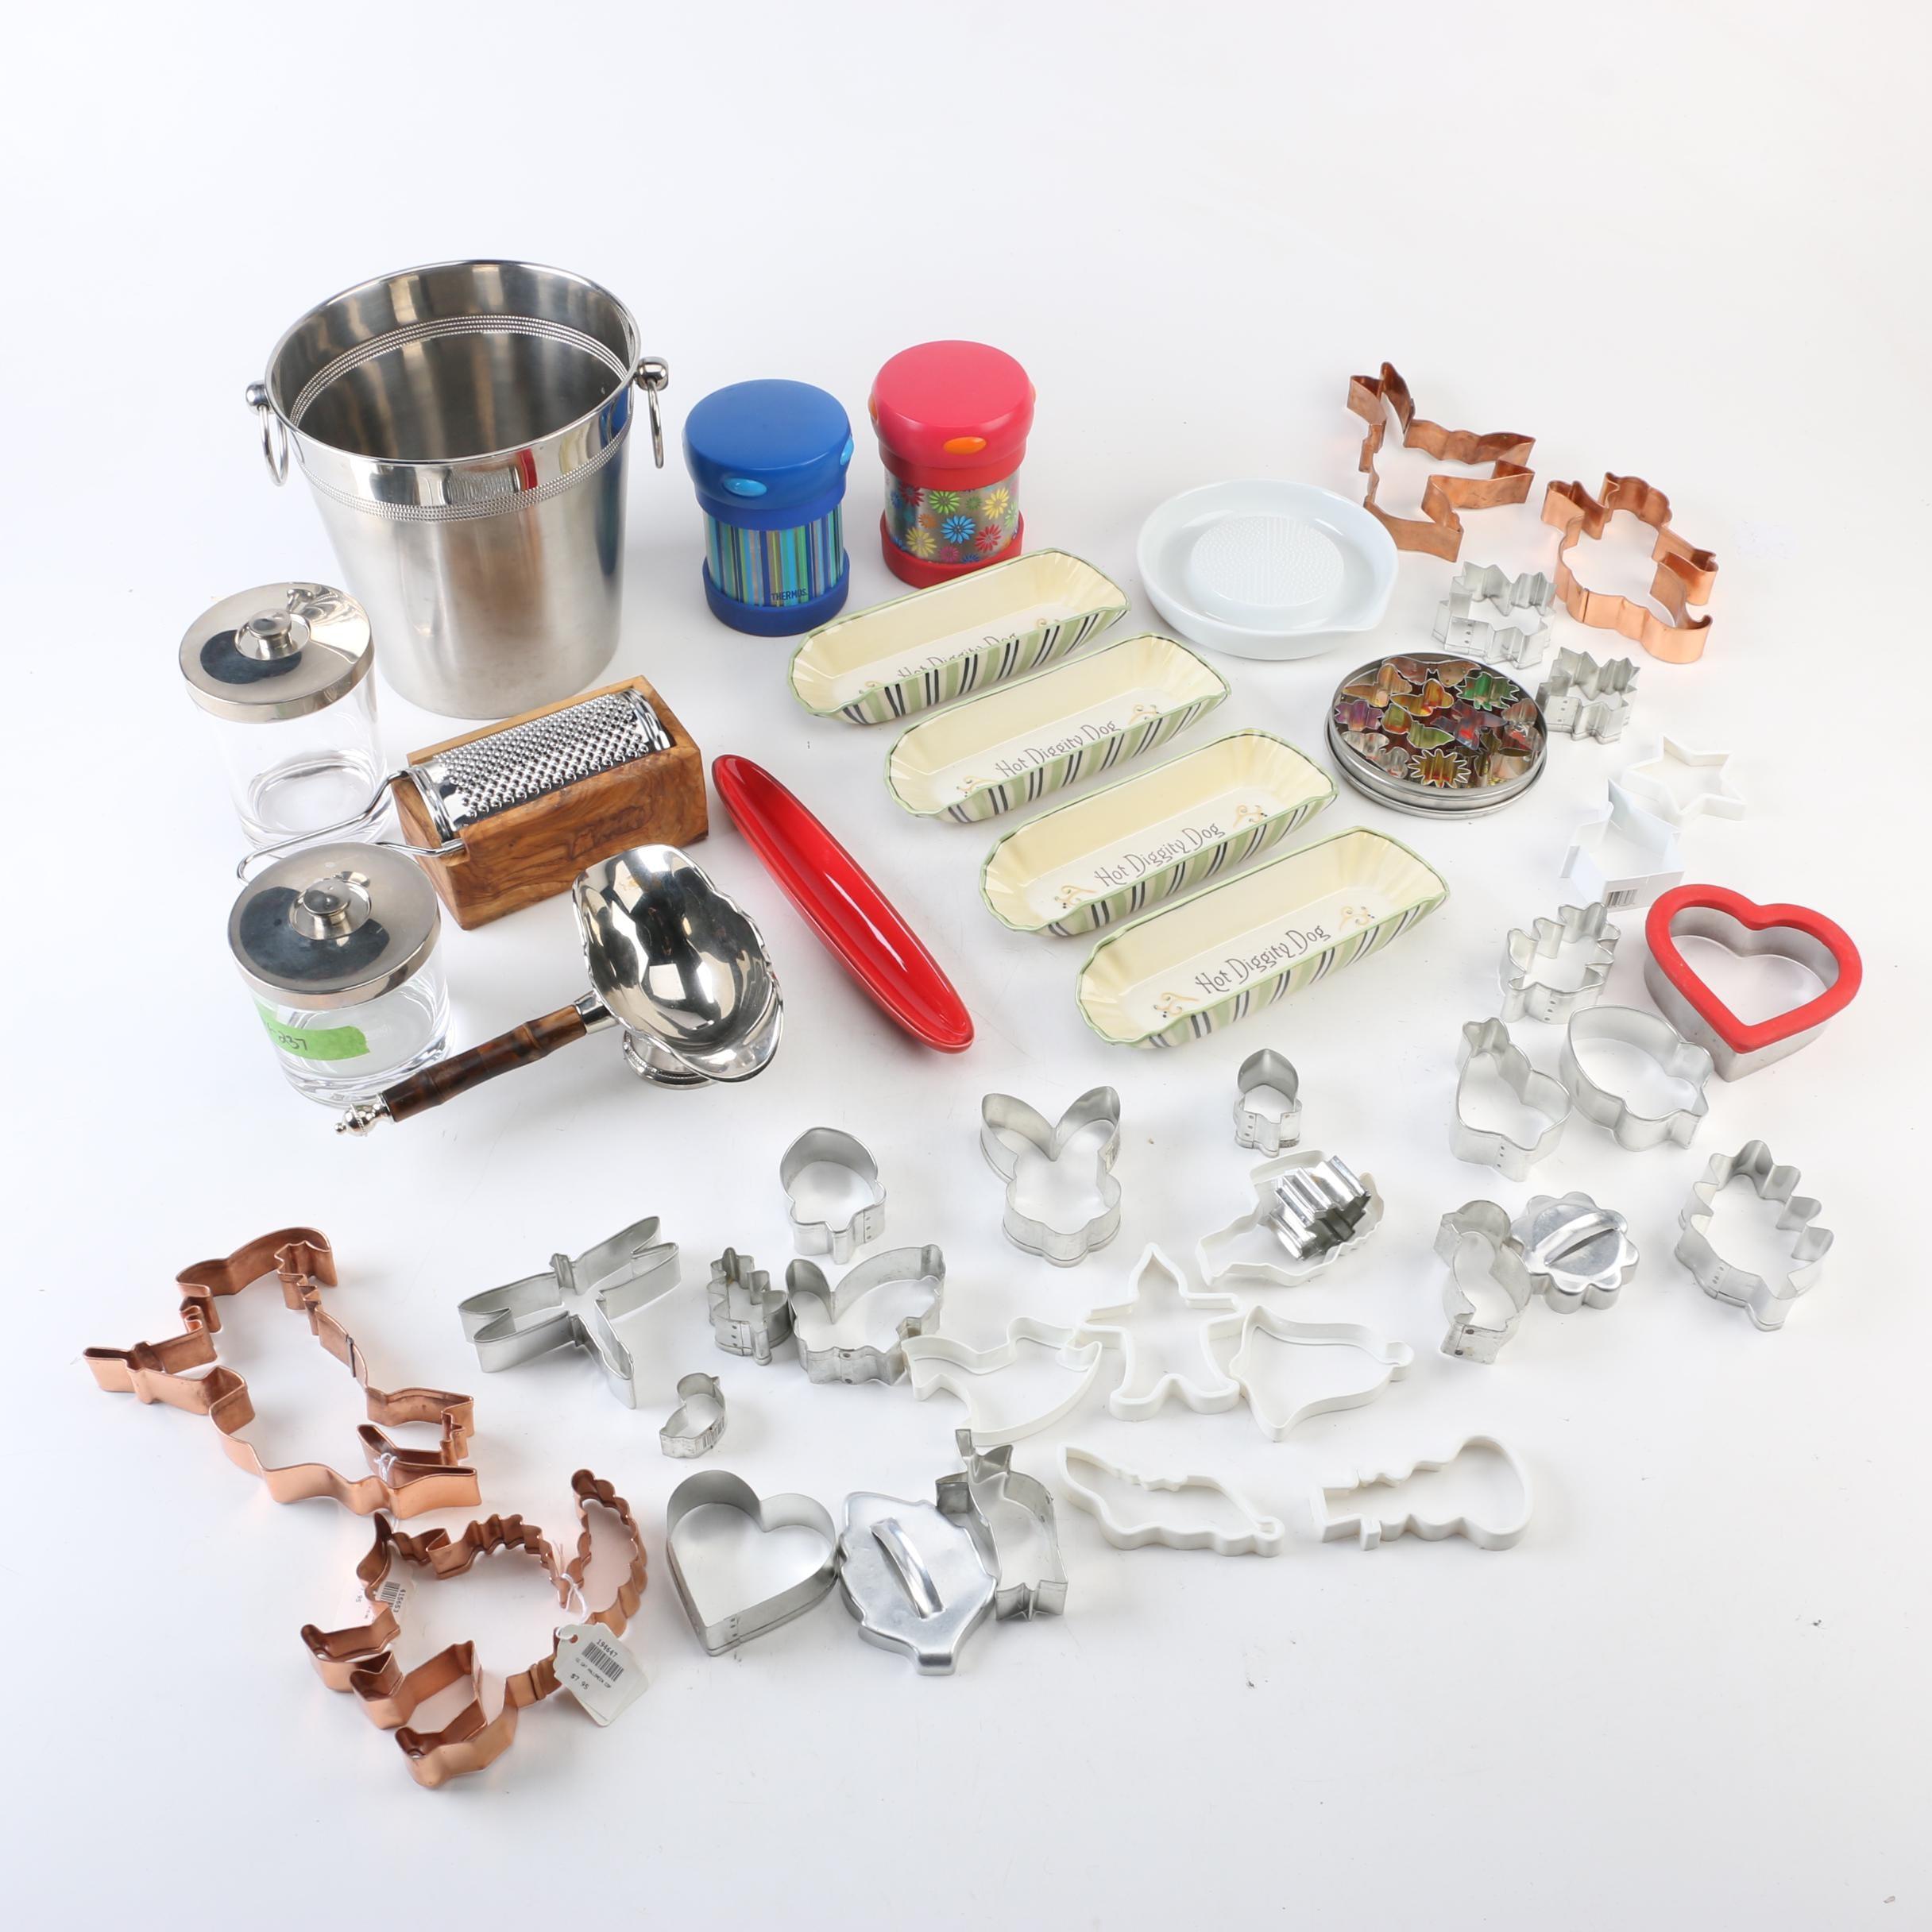 Bakeware and Kitchen Gadgets Including Restoration Hardware